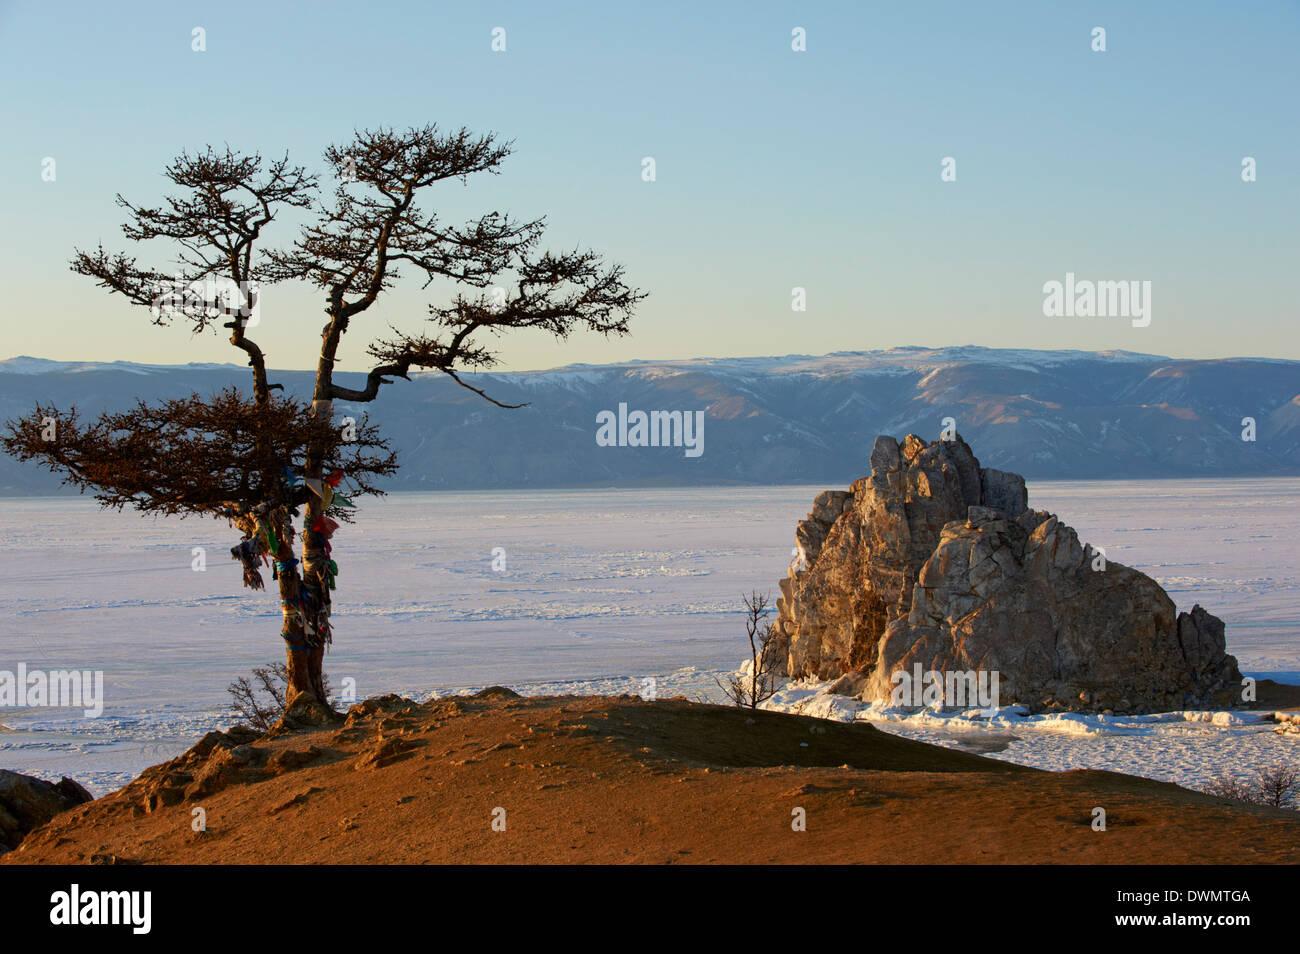 Shaman rock, Maloe More (Little Sea), Olkhon island, Lake Baikal, UNESCO Site, Irkutsk Oblast, Siberia, Russia - Stock Image